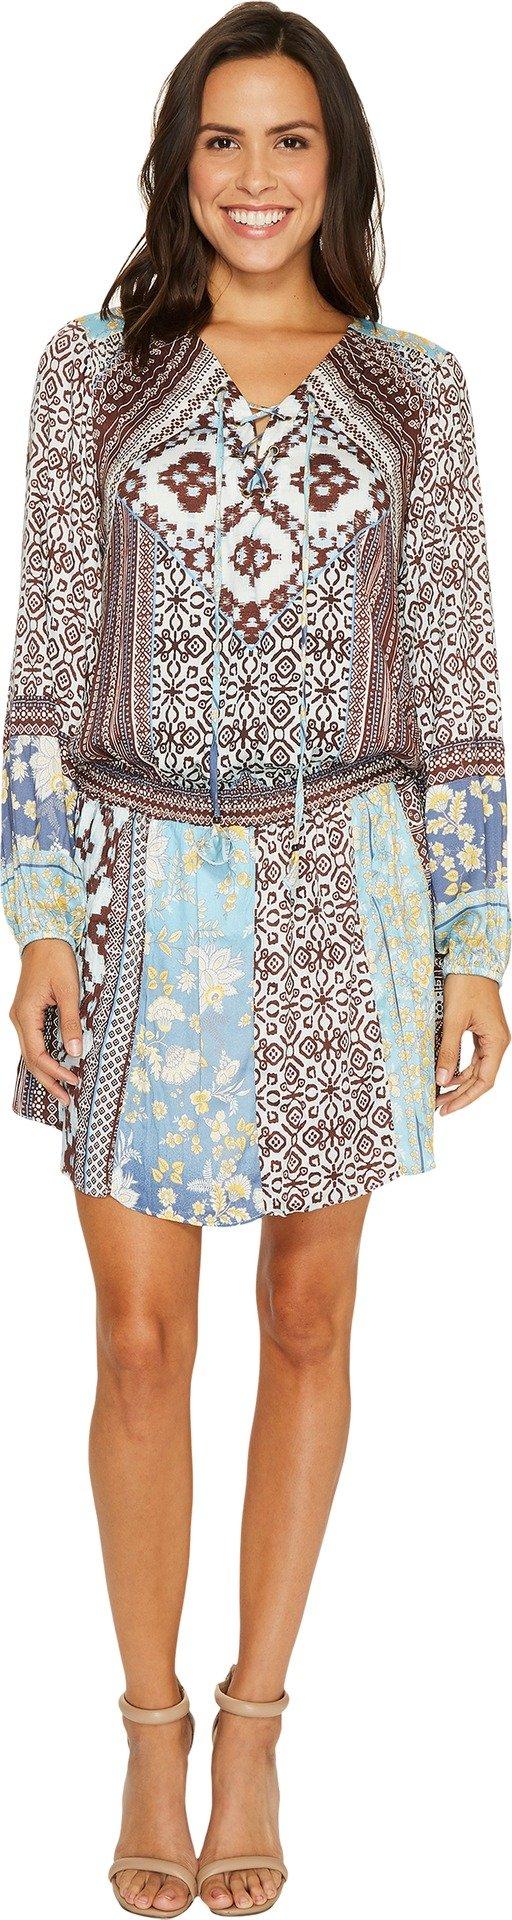 Hale Bob Women's A Fine Line Stretch Satin Woven Dress Blue Dress